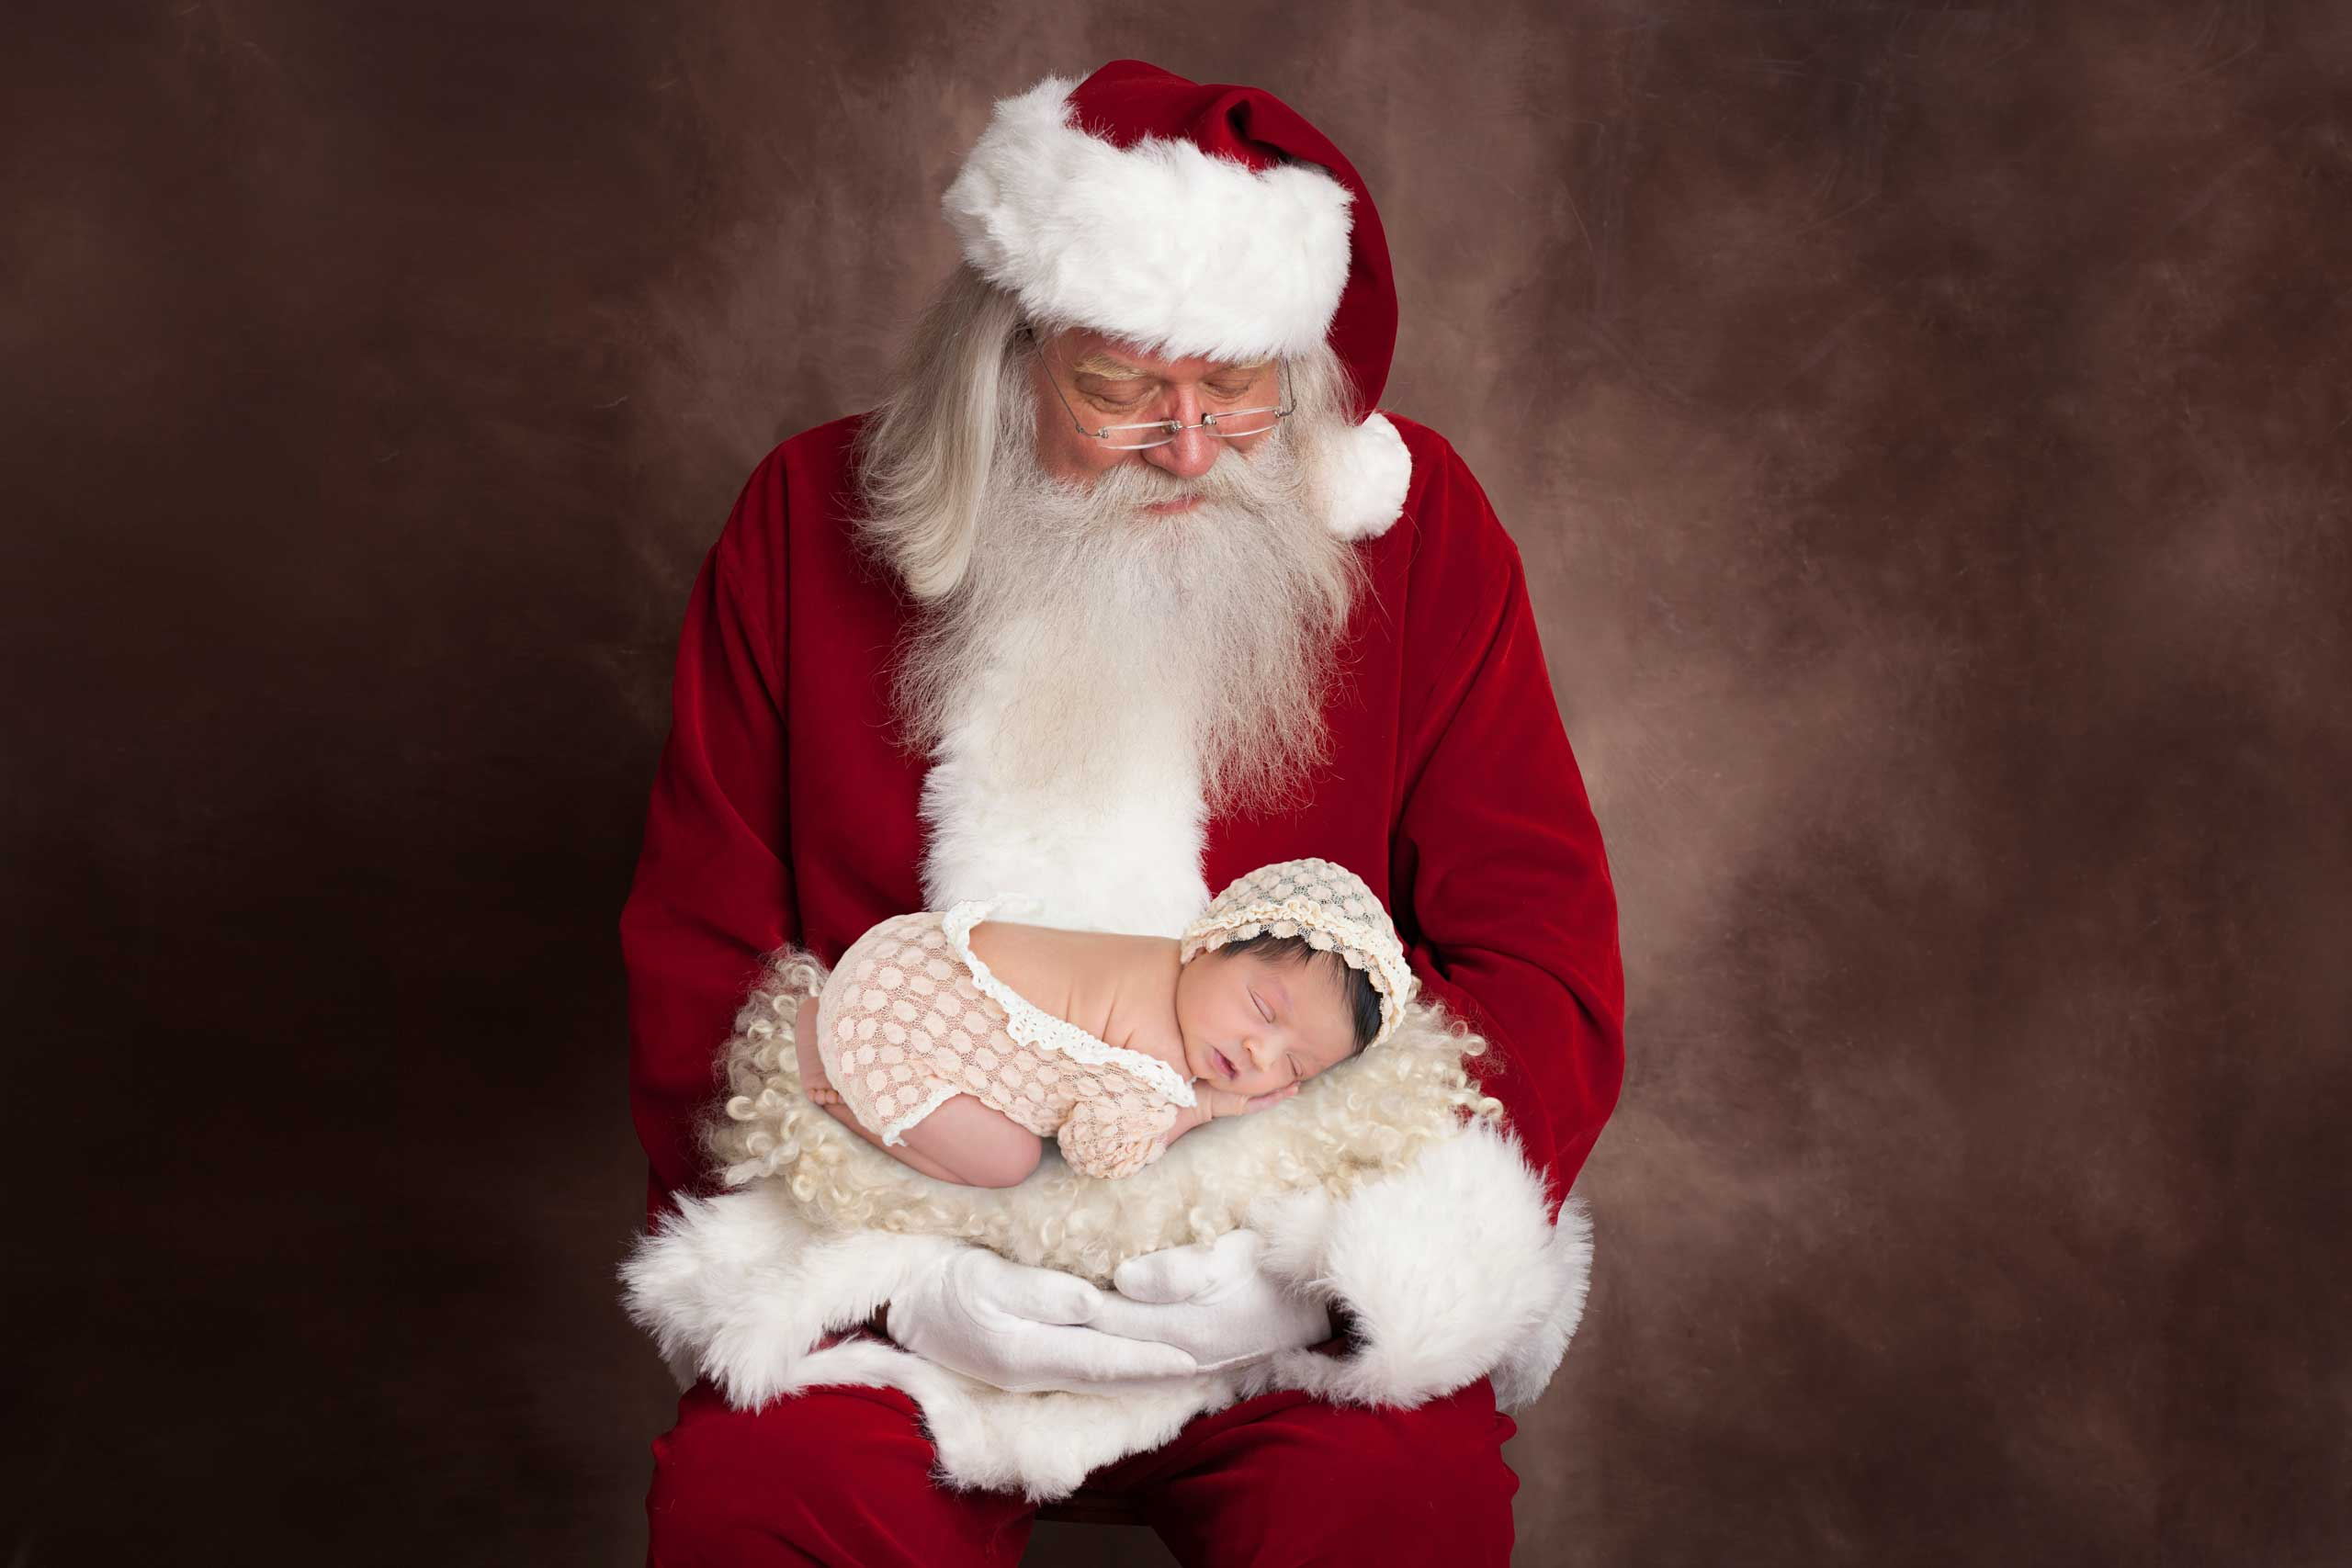 baby Santa photograph taken in Los Angeles by Ramina Magid Photography